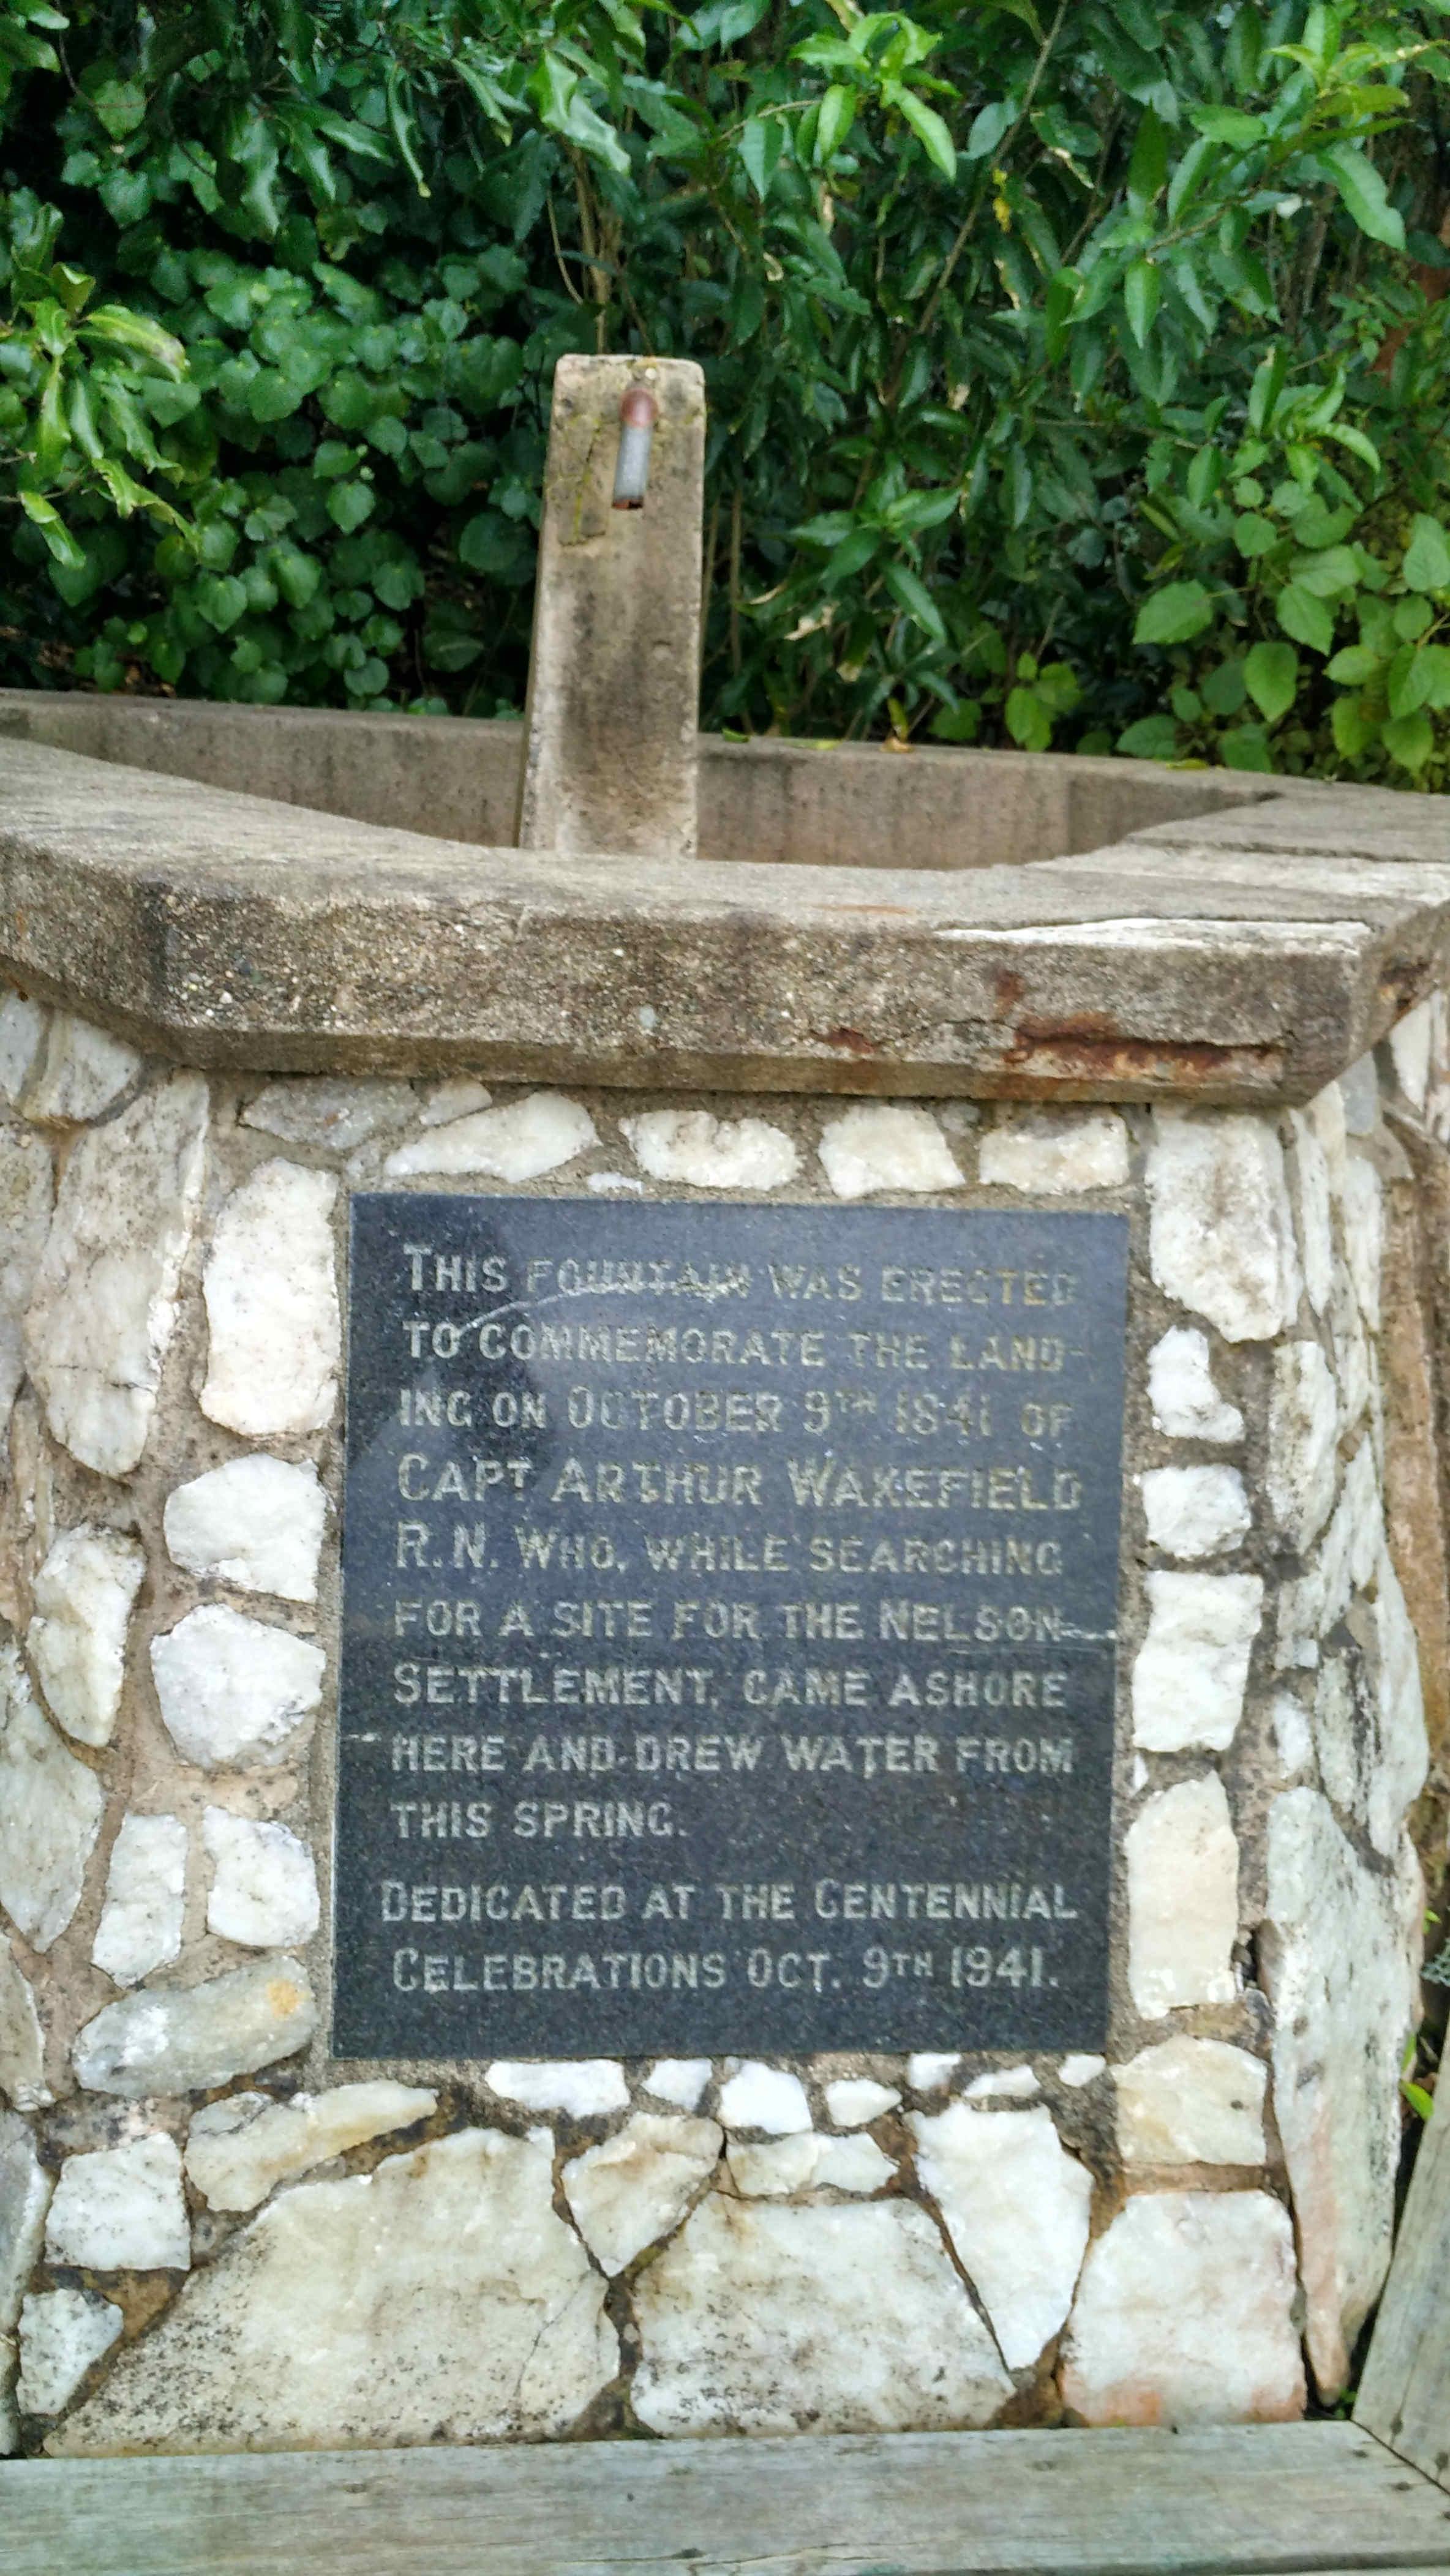 Commemorating the landing of Captain Arthur Wakefield in Nelson in 1841.